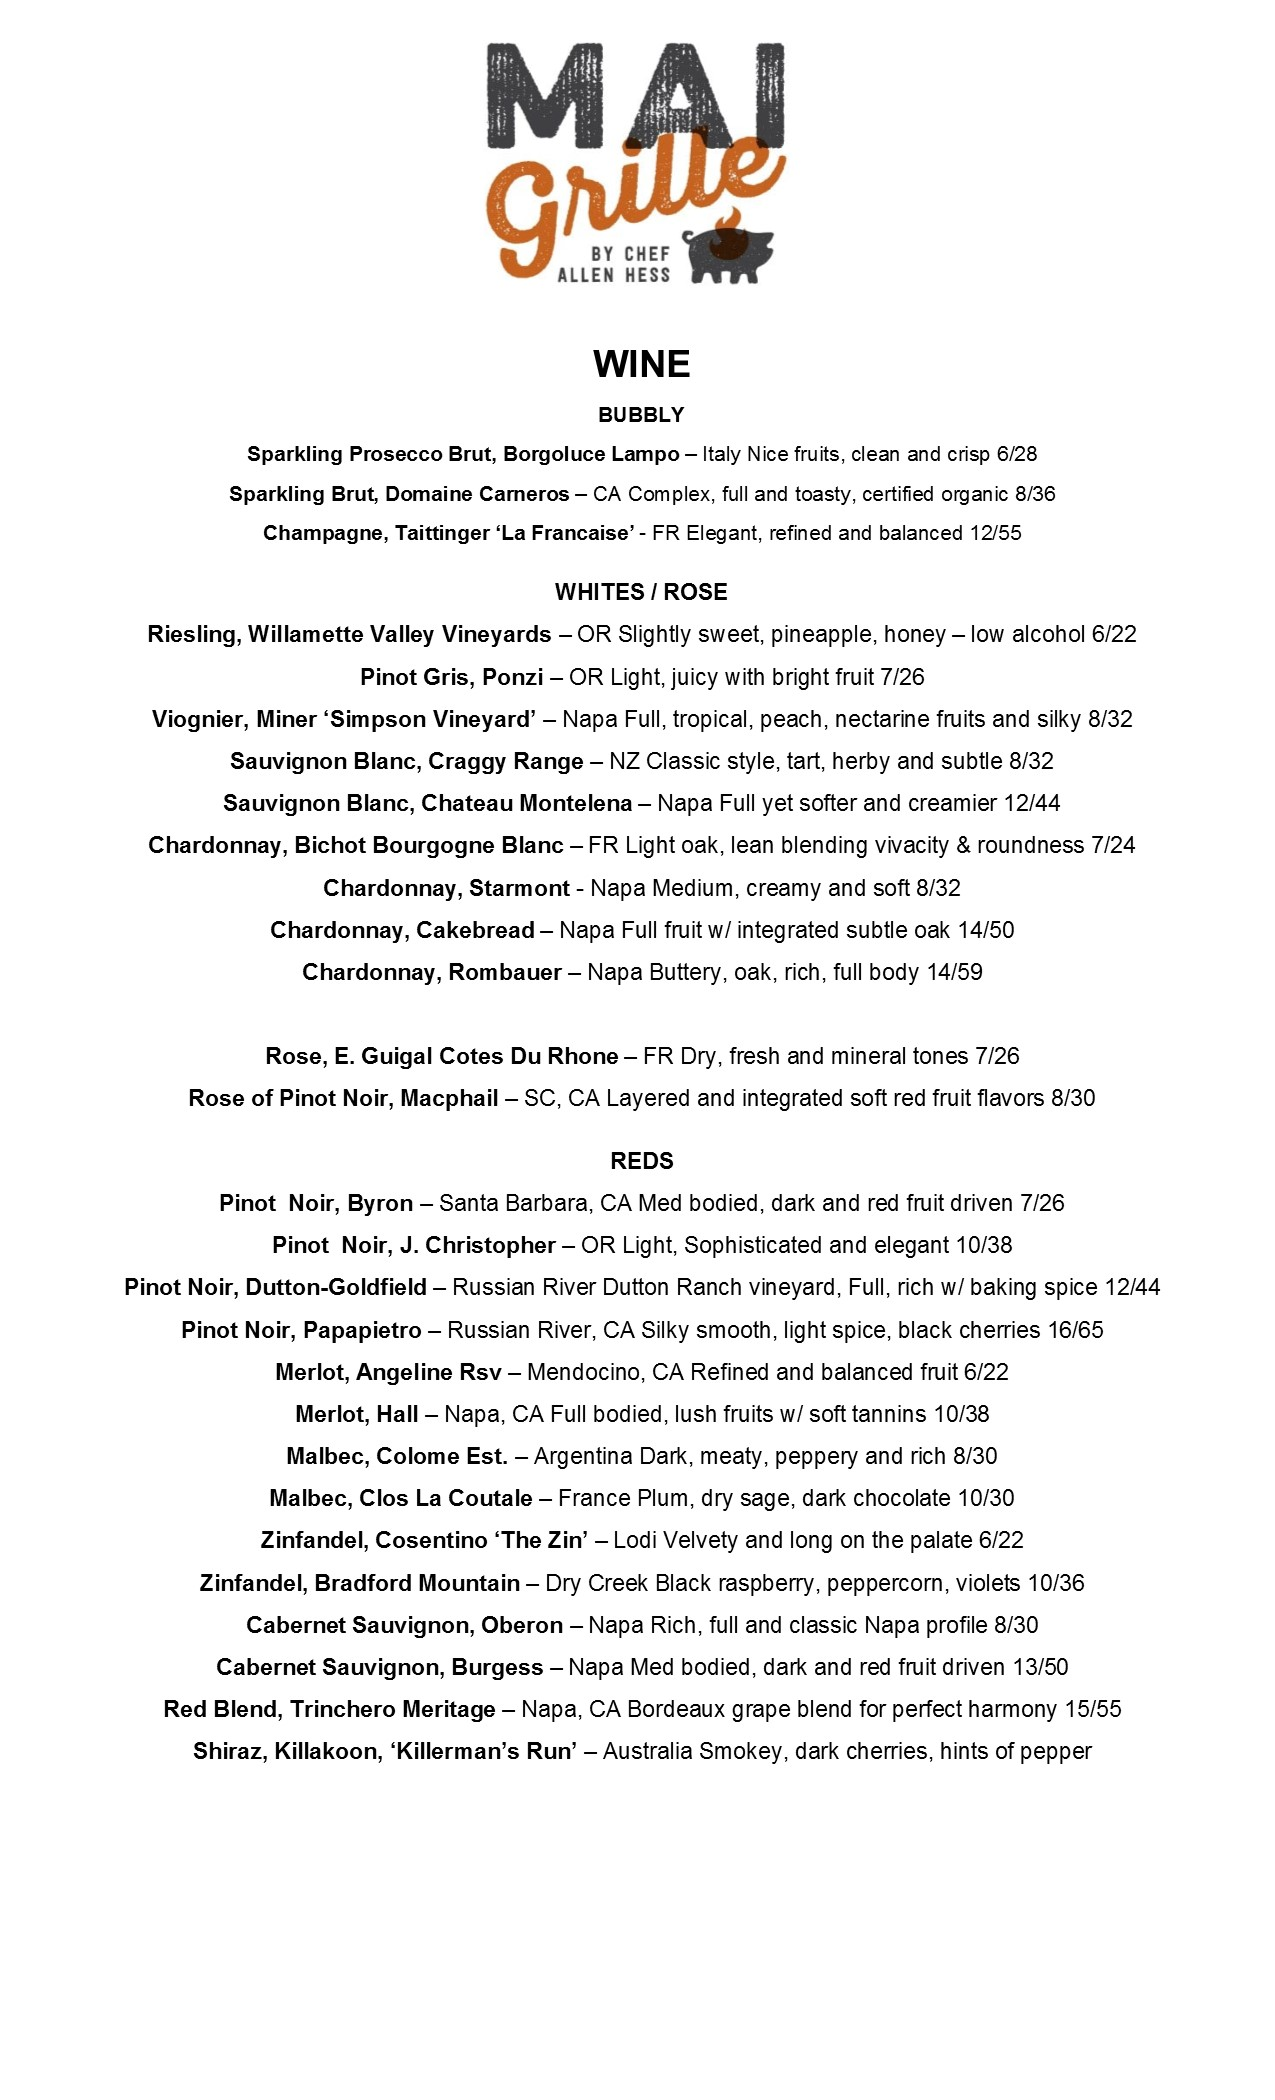 Wine List Mai Grille by Chef Allen Hess